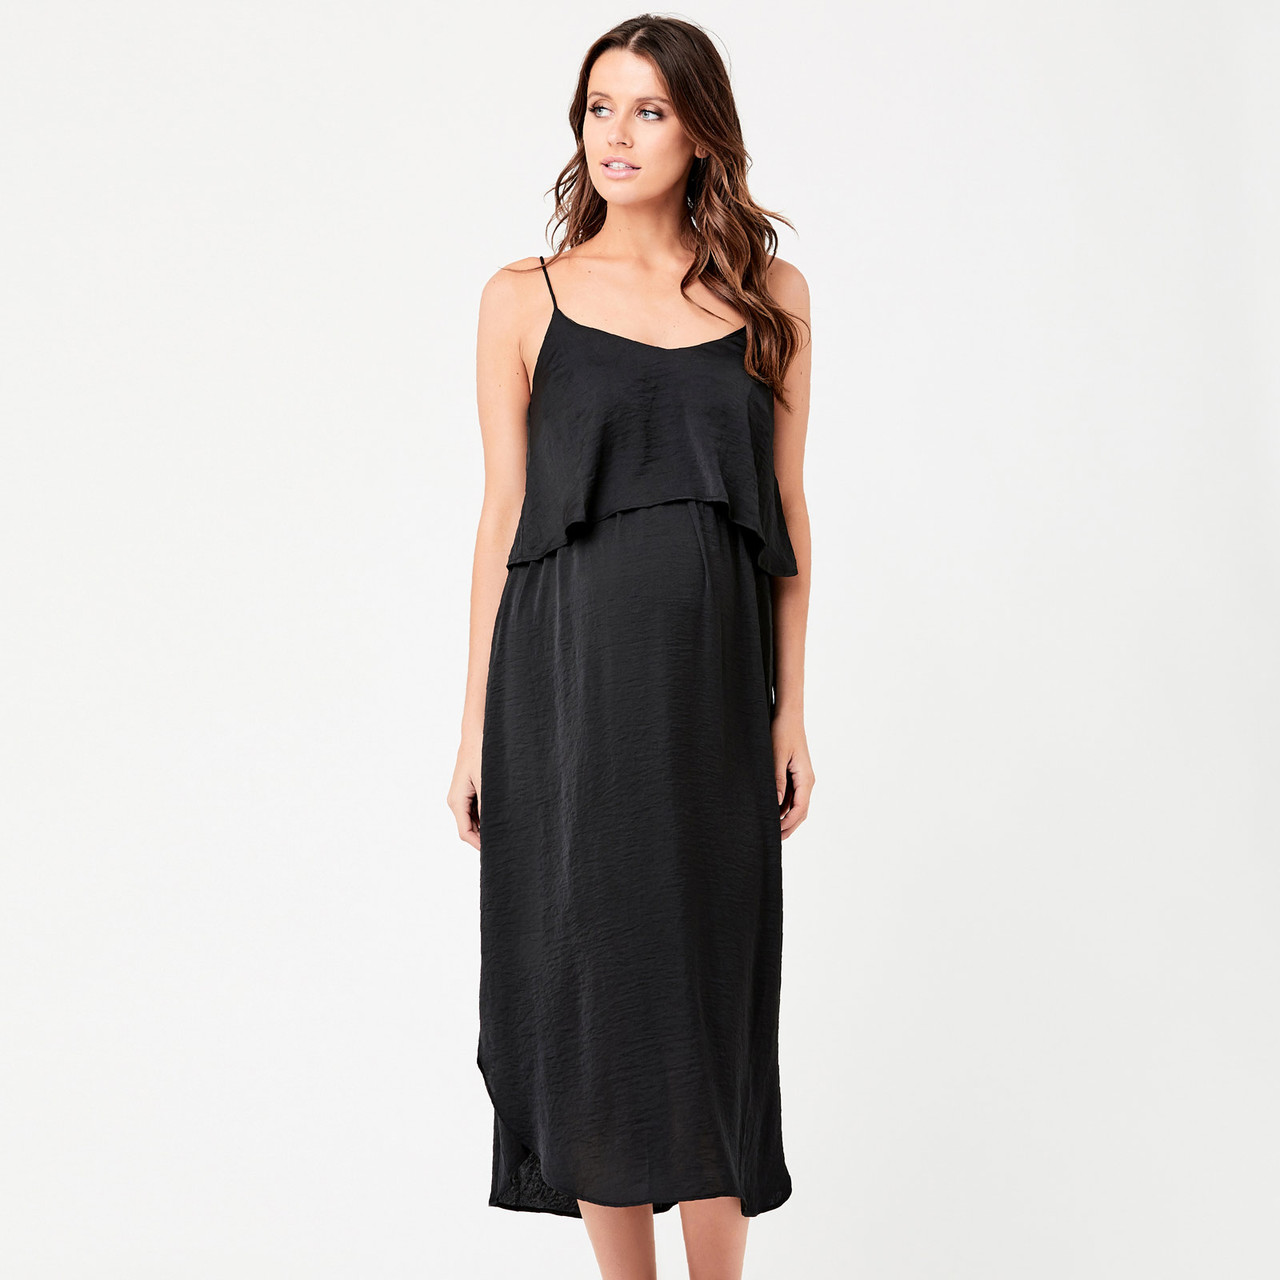 dacc04d531edf Ripe Maternity Nursing Slip Dress - Black